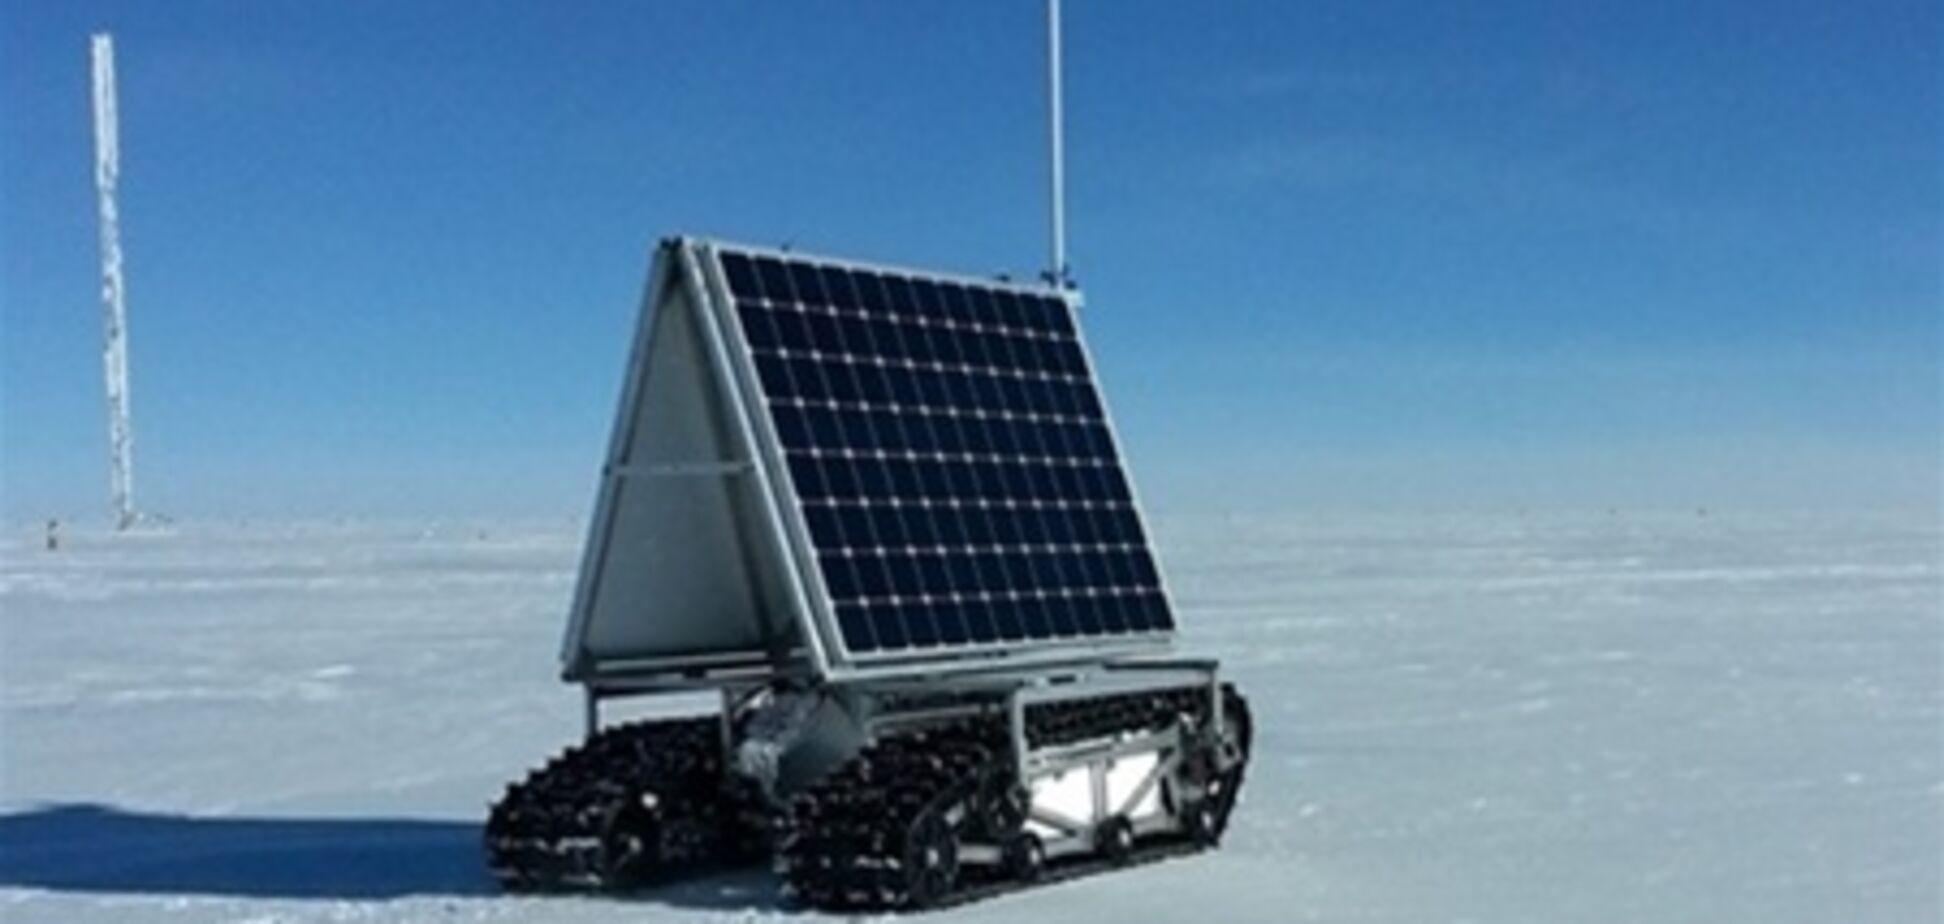 NASA тестирует робота-полярника на солнечных батареях в Гренландии